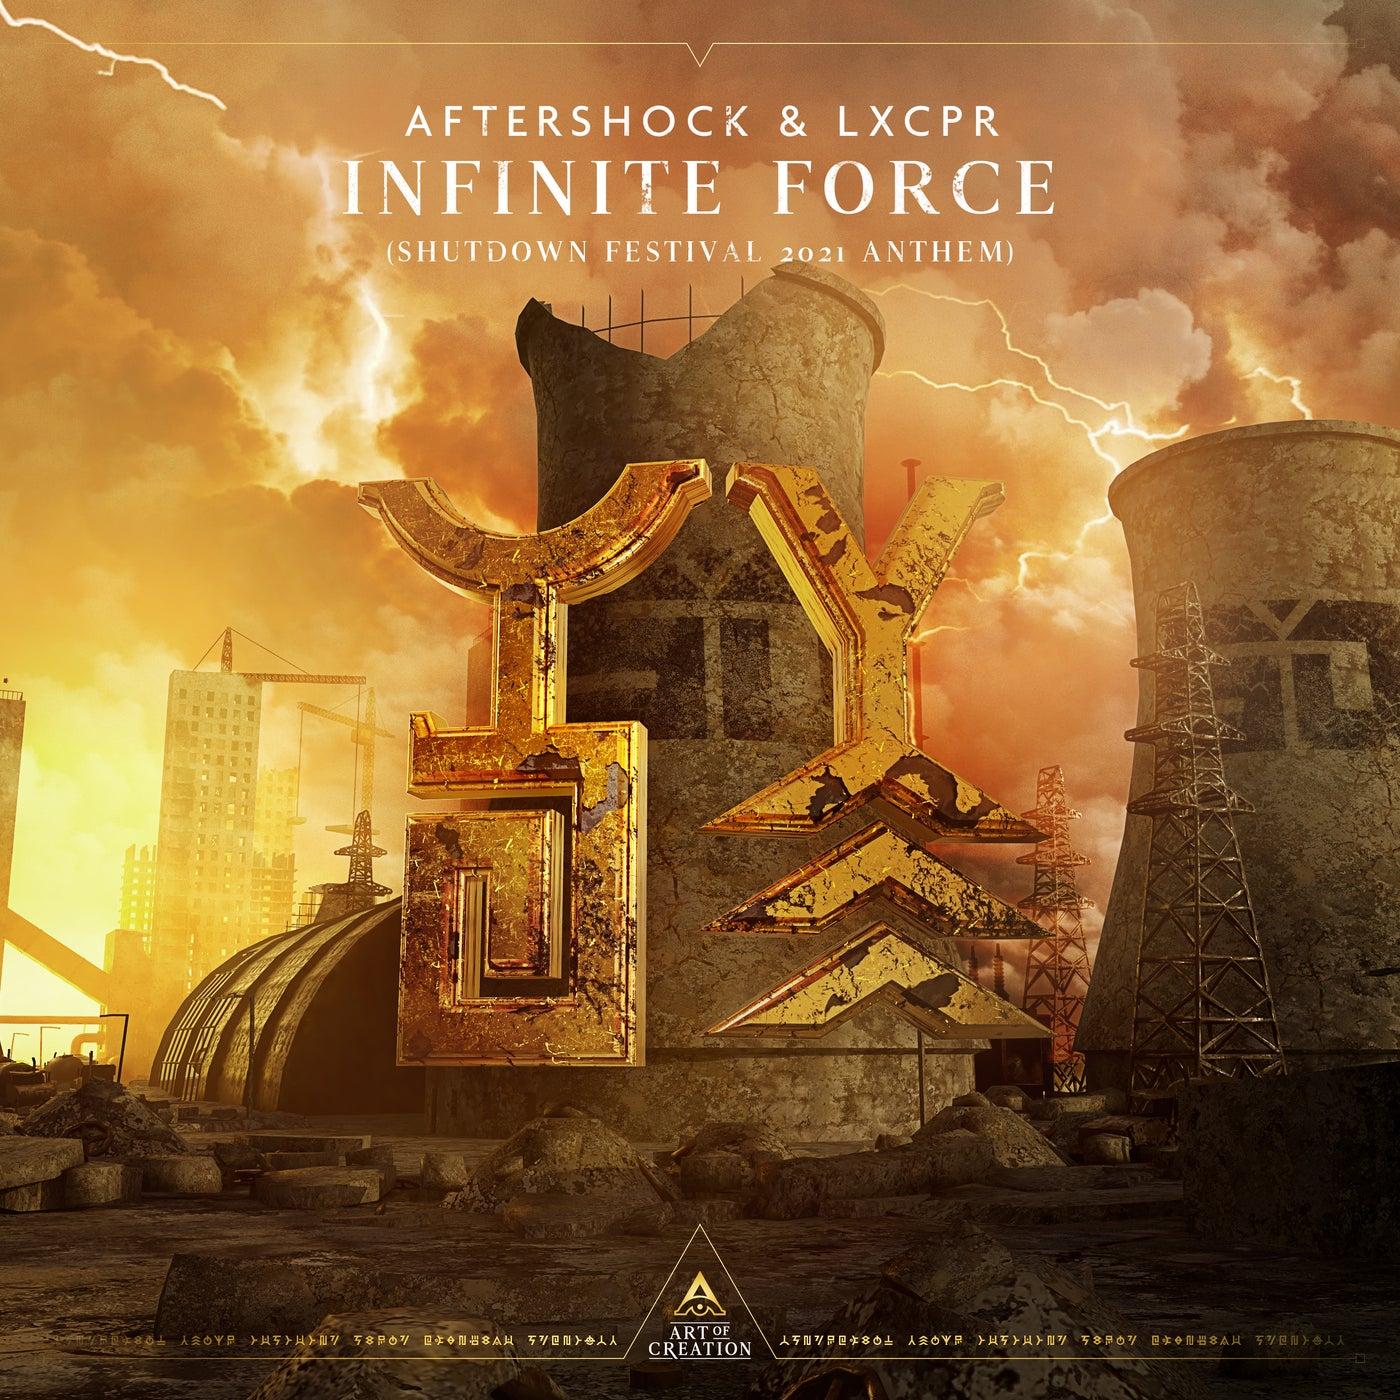 Infinite Force (Shutdown Festival 2021 Anthem) (Extended Mix)